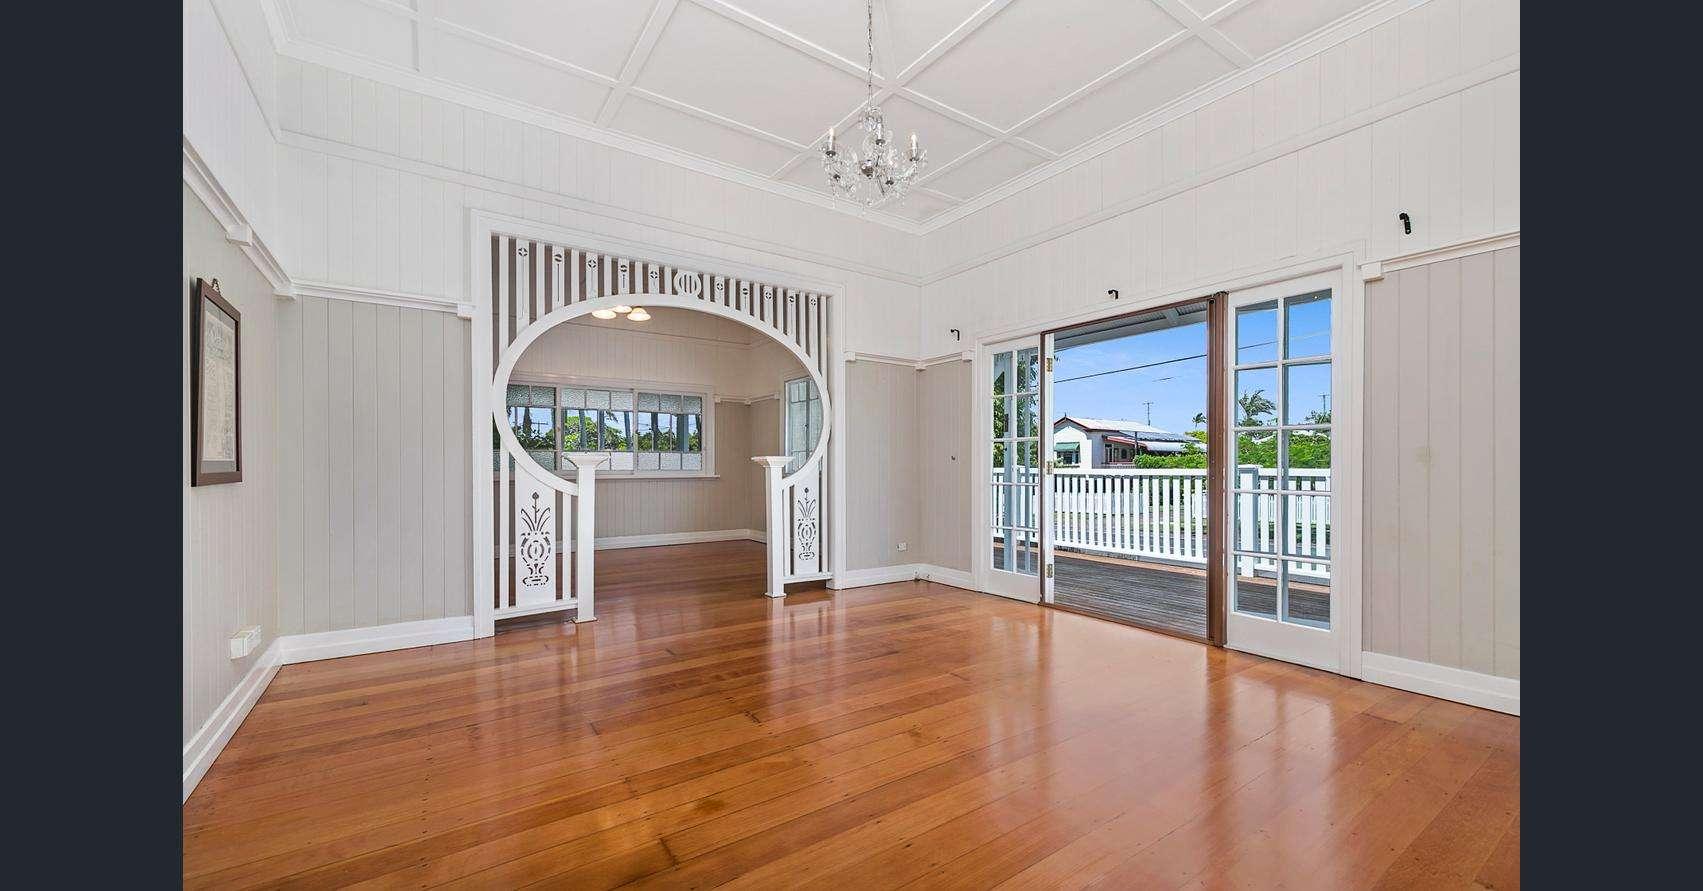 56 Carnation Street, Wynnum, QLD 4178 - House for Rent - Ray